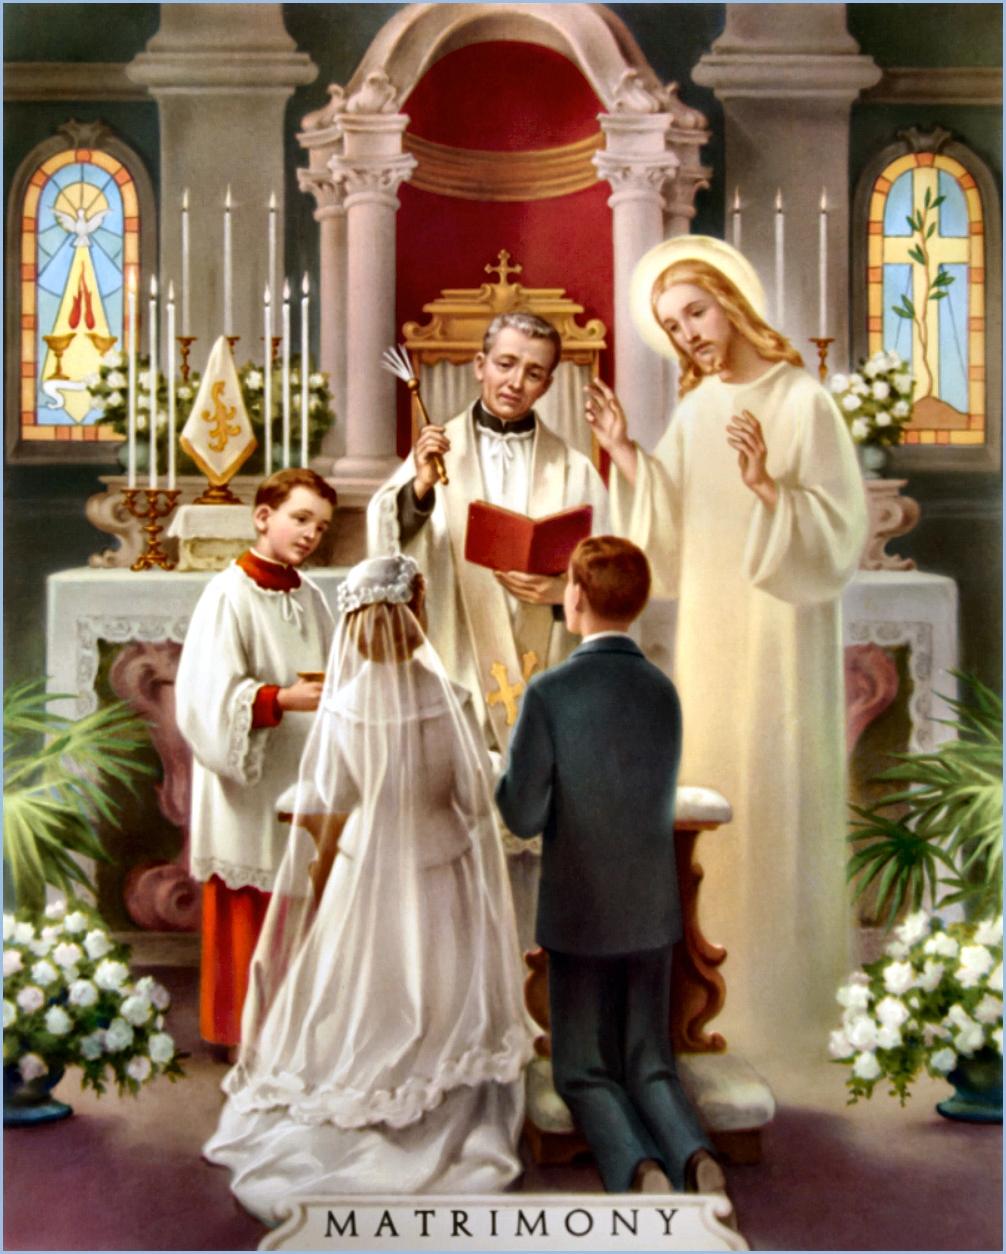 Matrimonio Catolico Tradicional : La verdadera forma y materia de los sacramentos catÓlicos